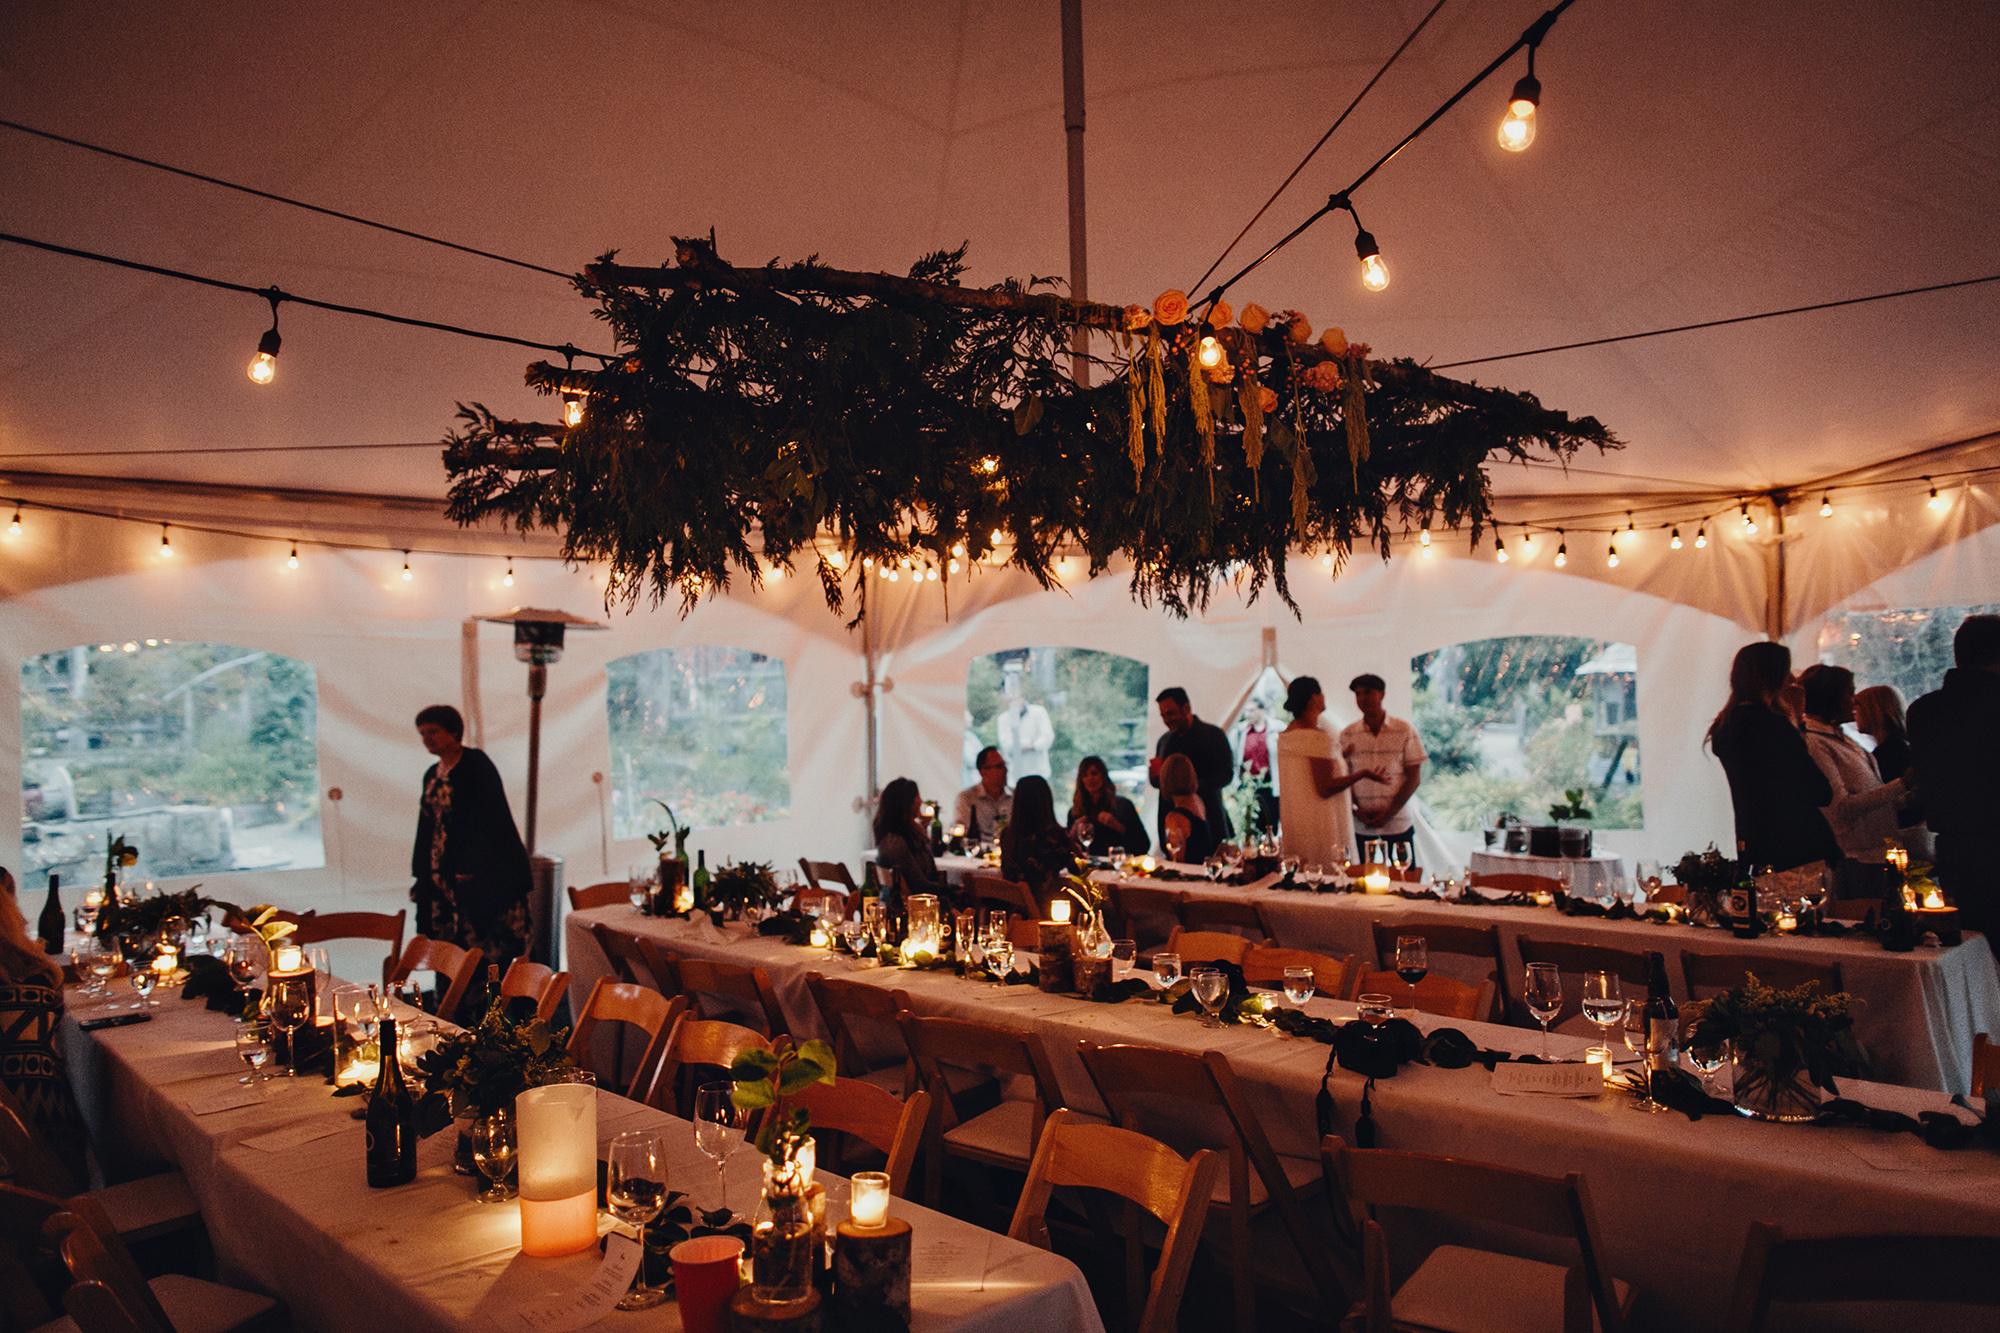 Tofino-Botanical-Gardens-Wedding-Photos-0142.jpg